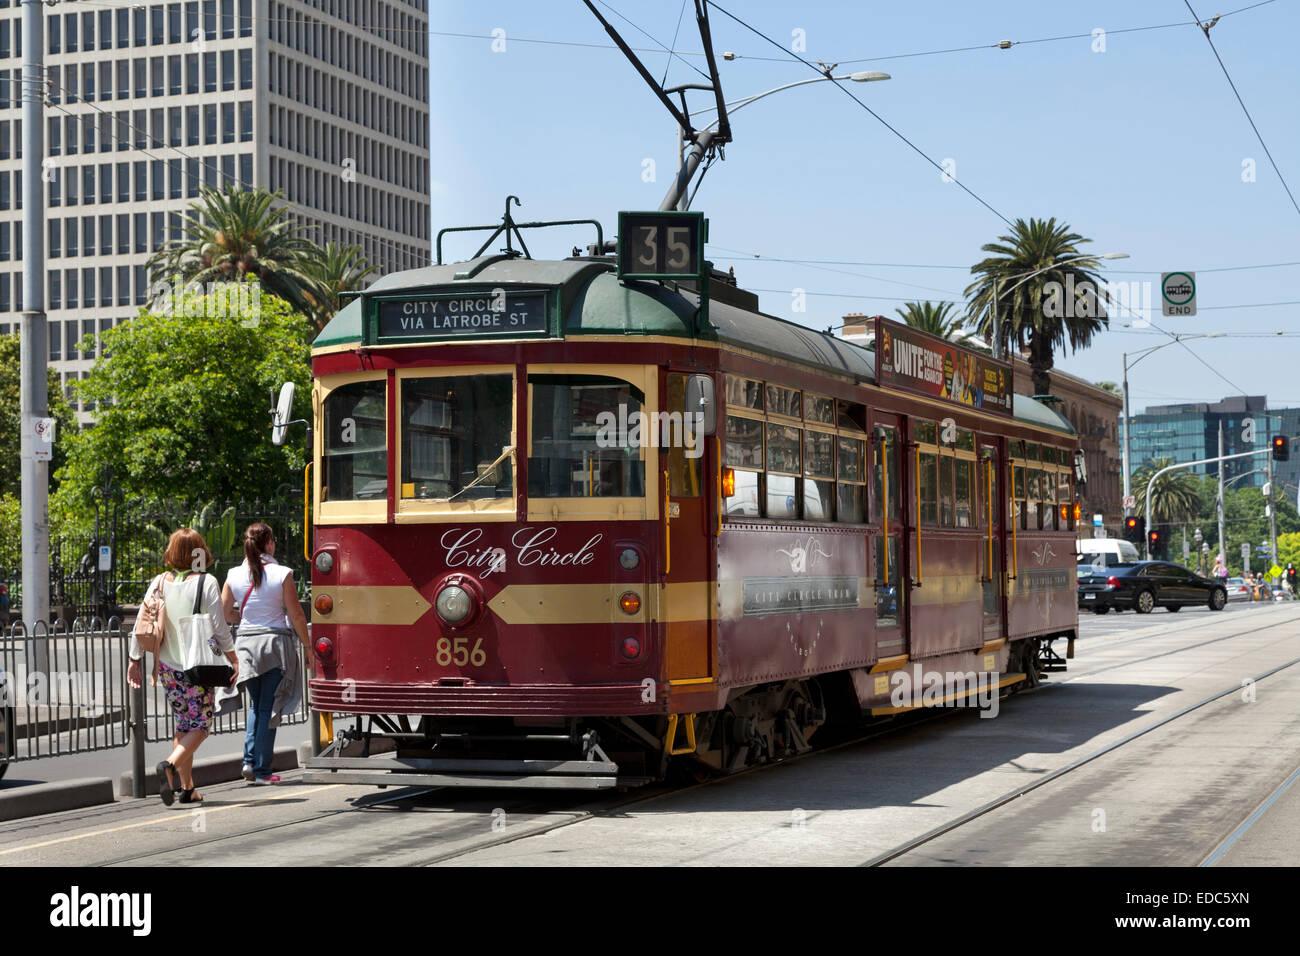 City circle tram in Melbourne, Australia - Stock Image